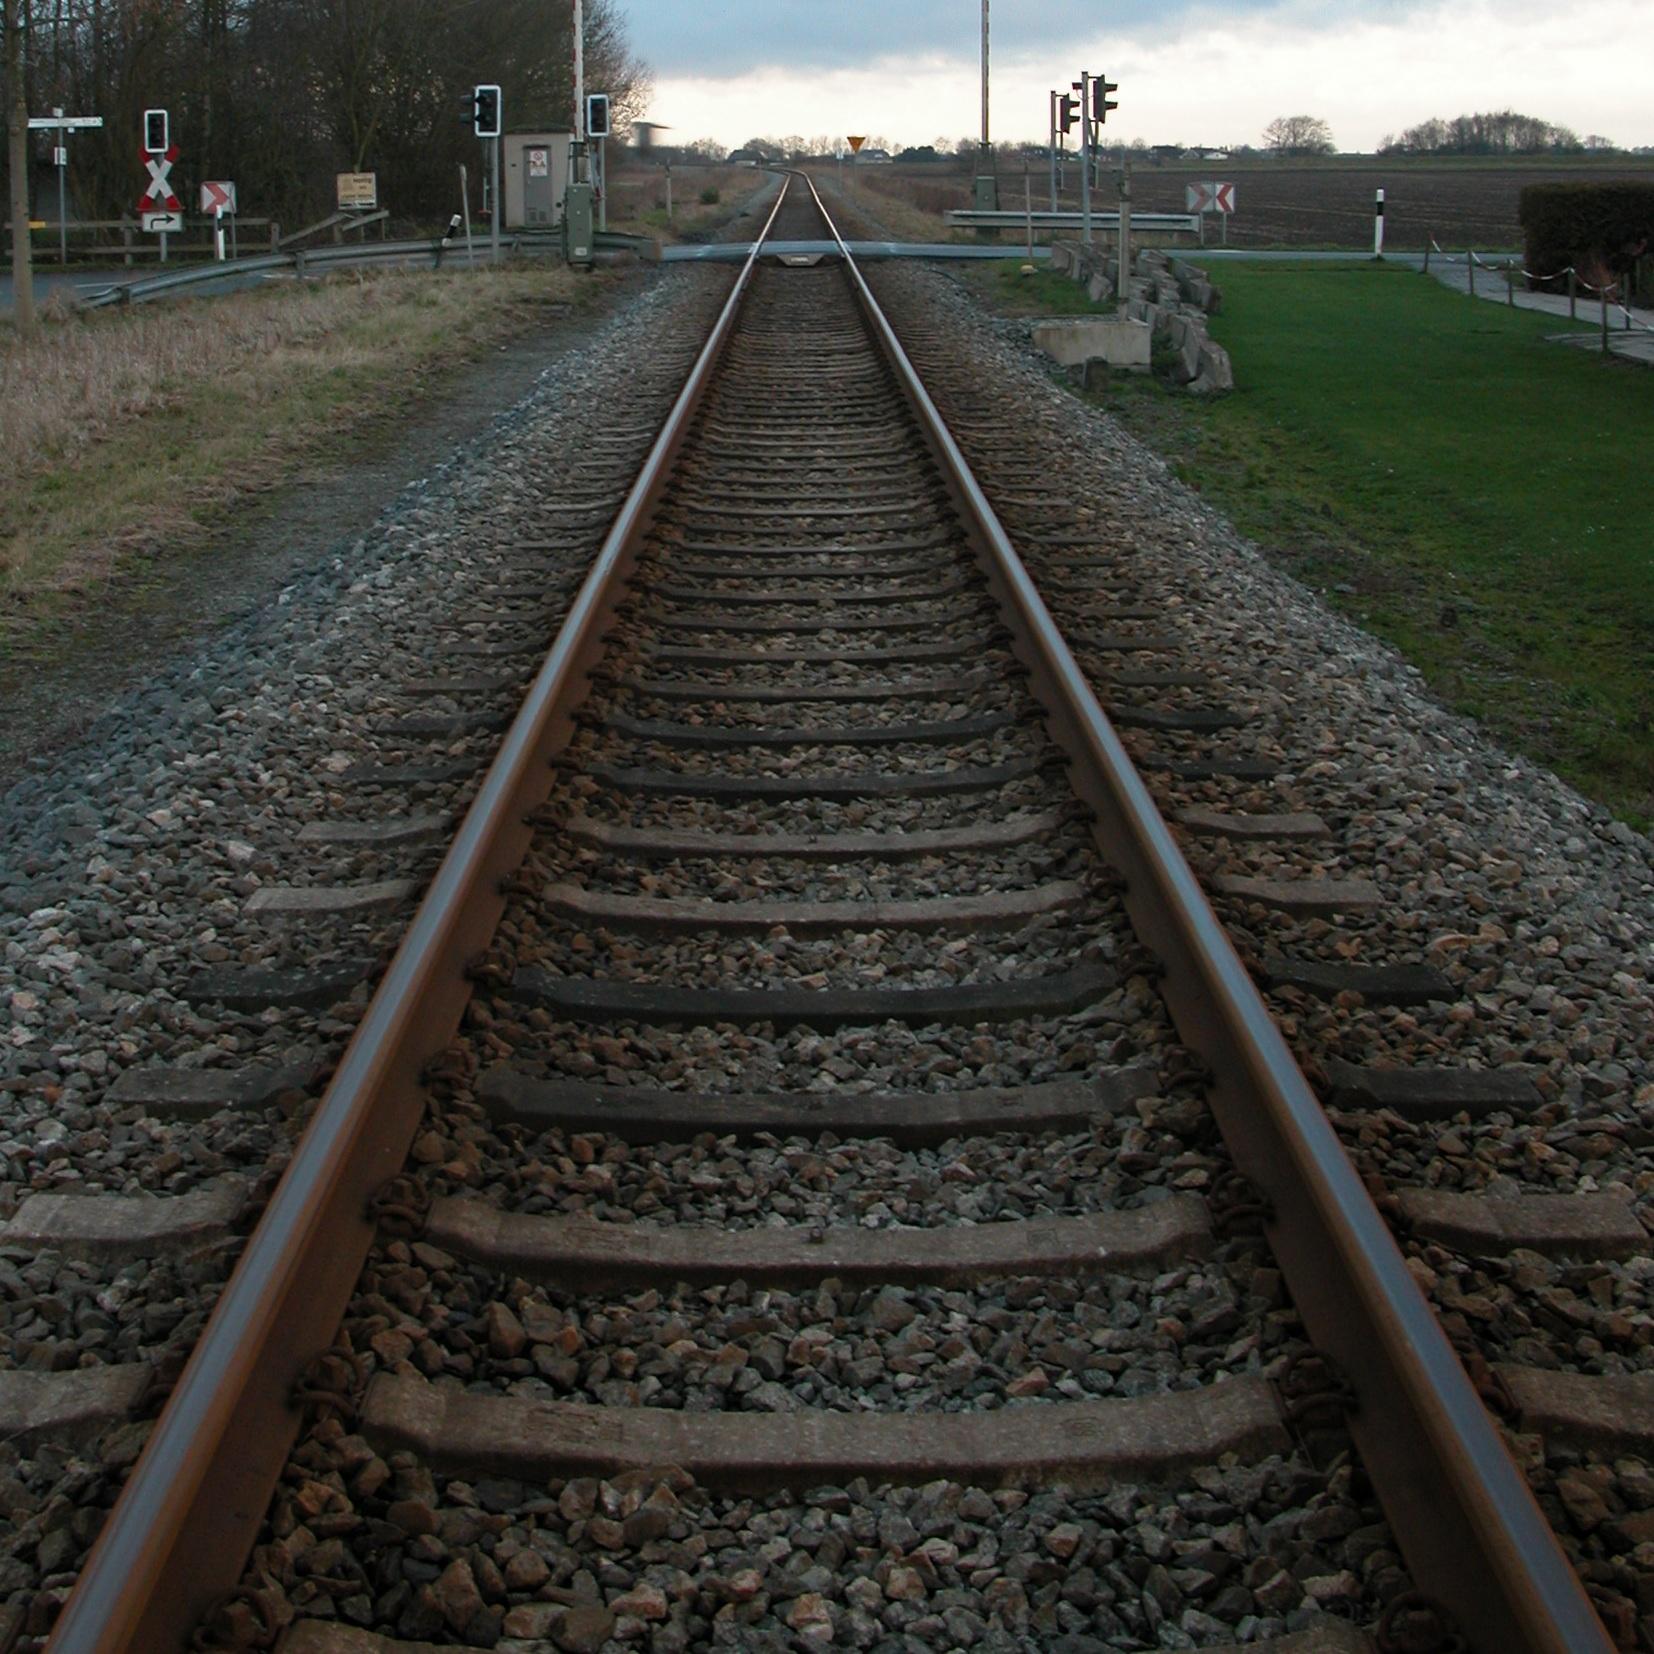 Railroad Tracks Image - Train Track PNG HD